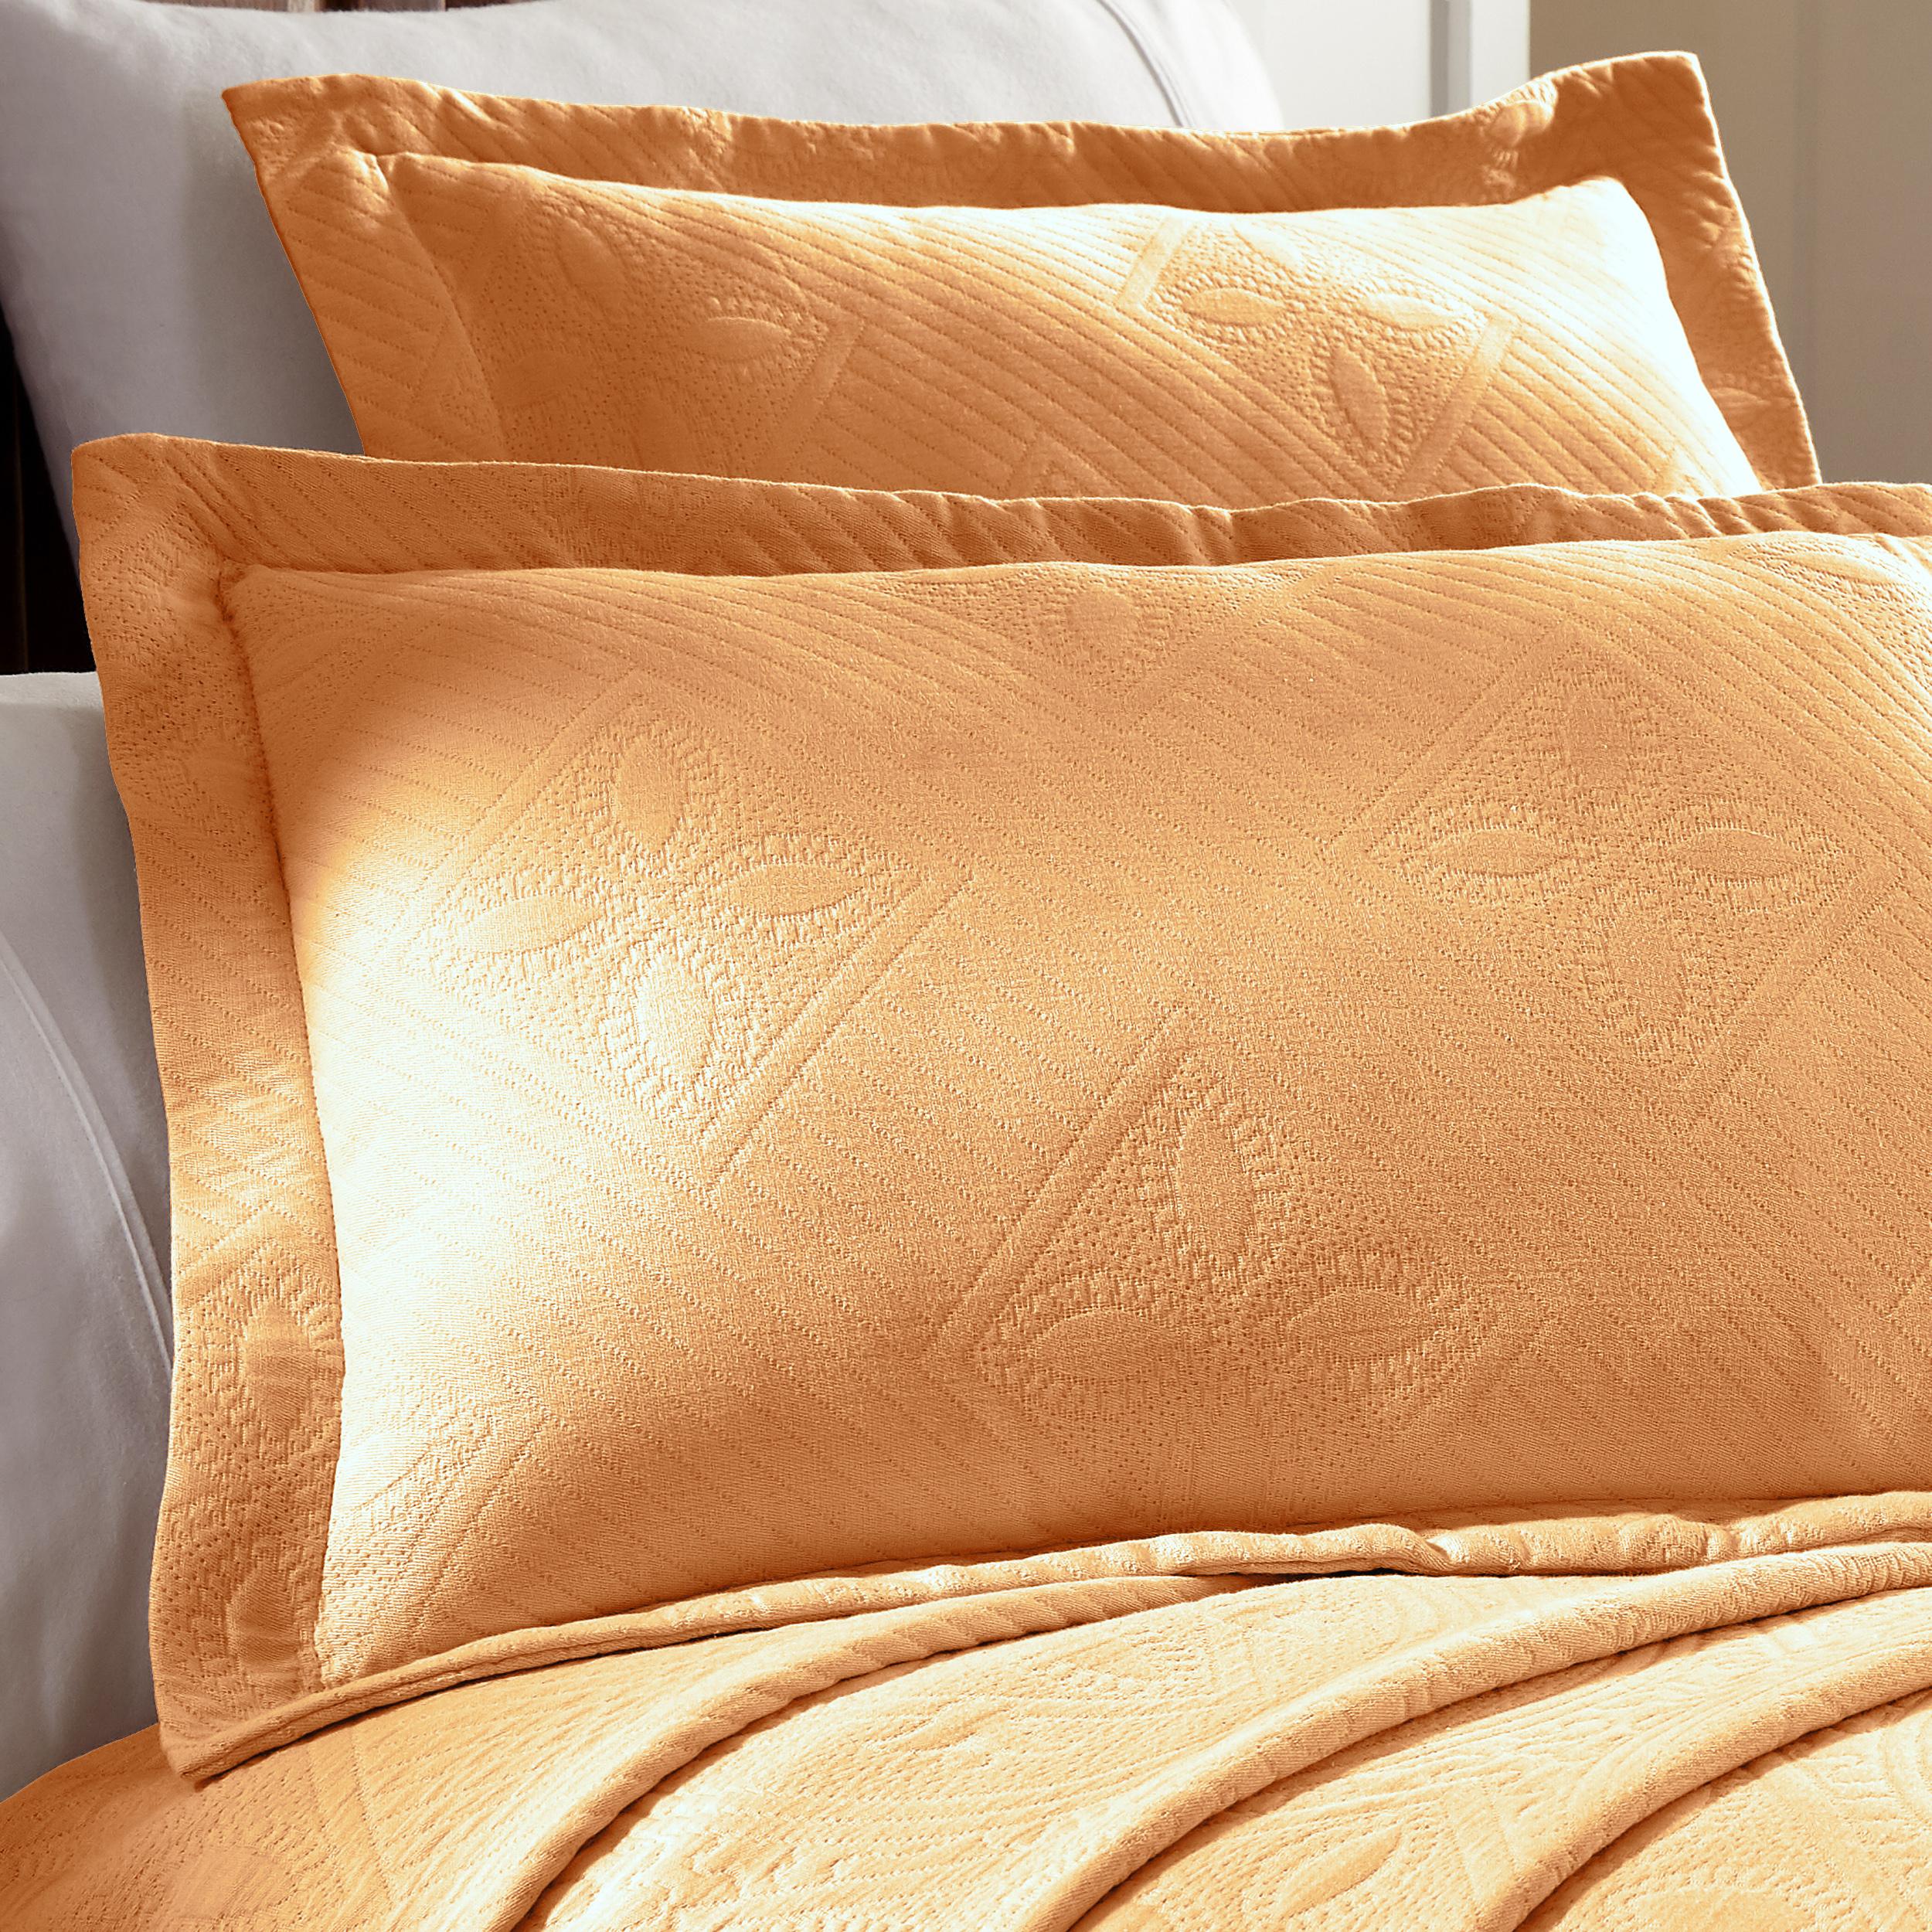 Celtic-Circle-Cotton-Jacquard-Matelasse-Scalloped-Bedspread-Set thumbnail 27